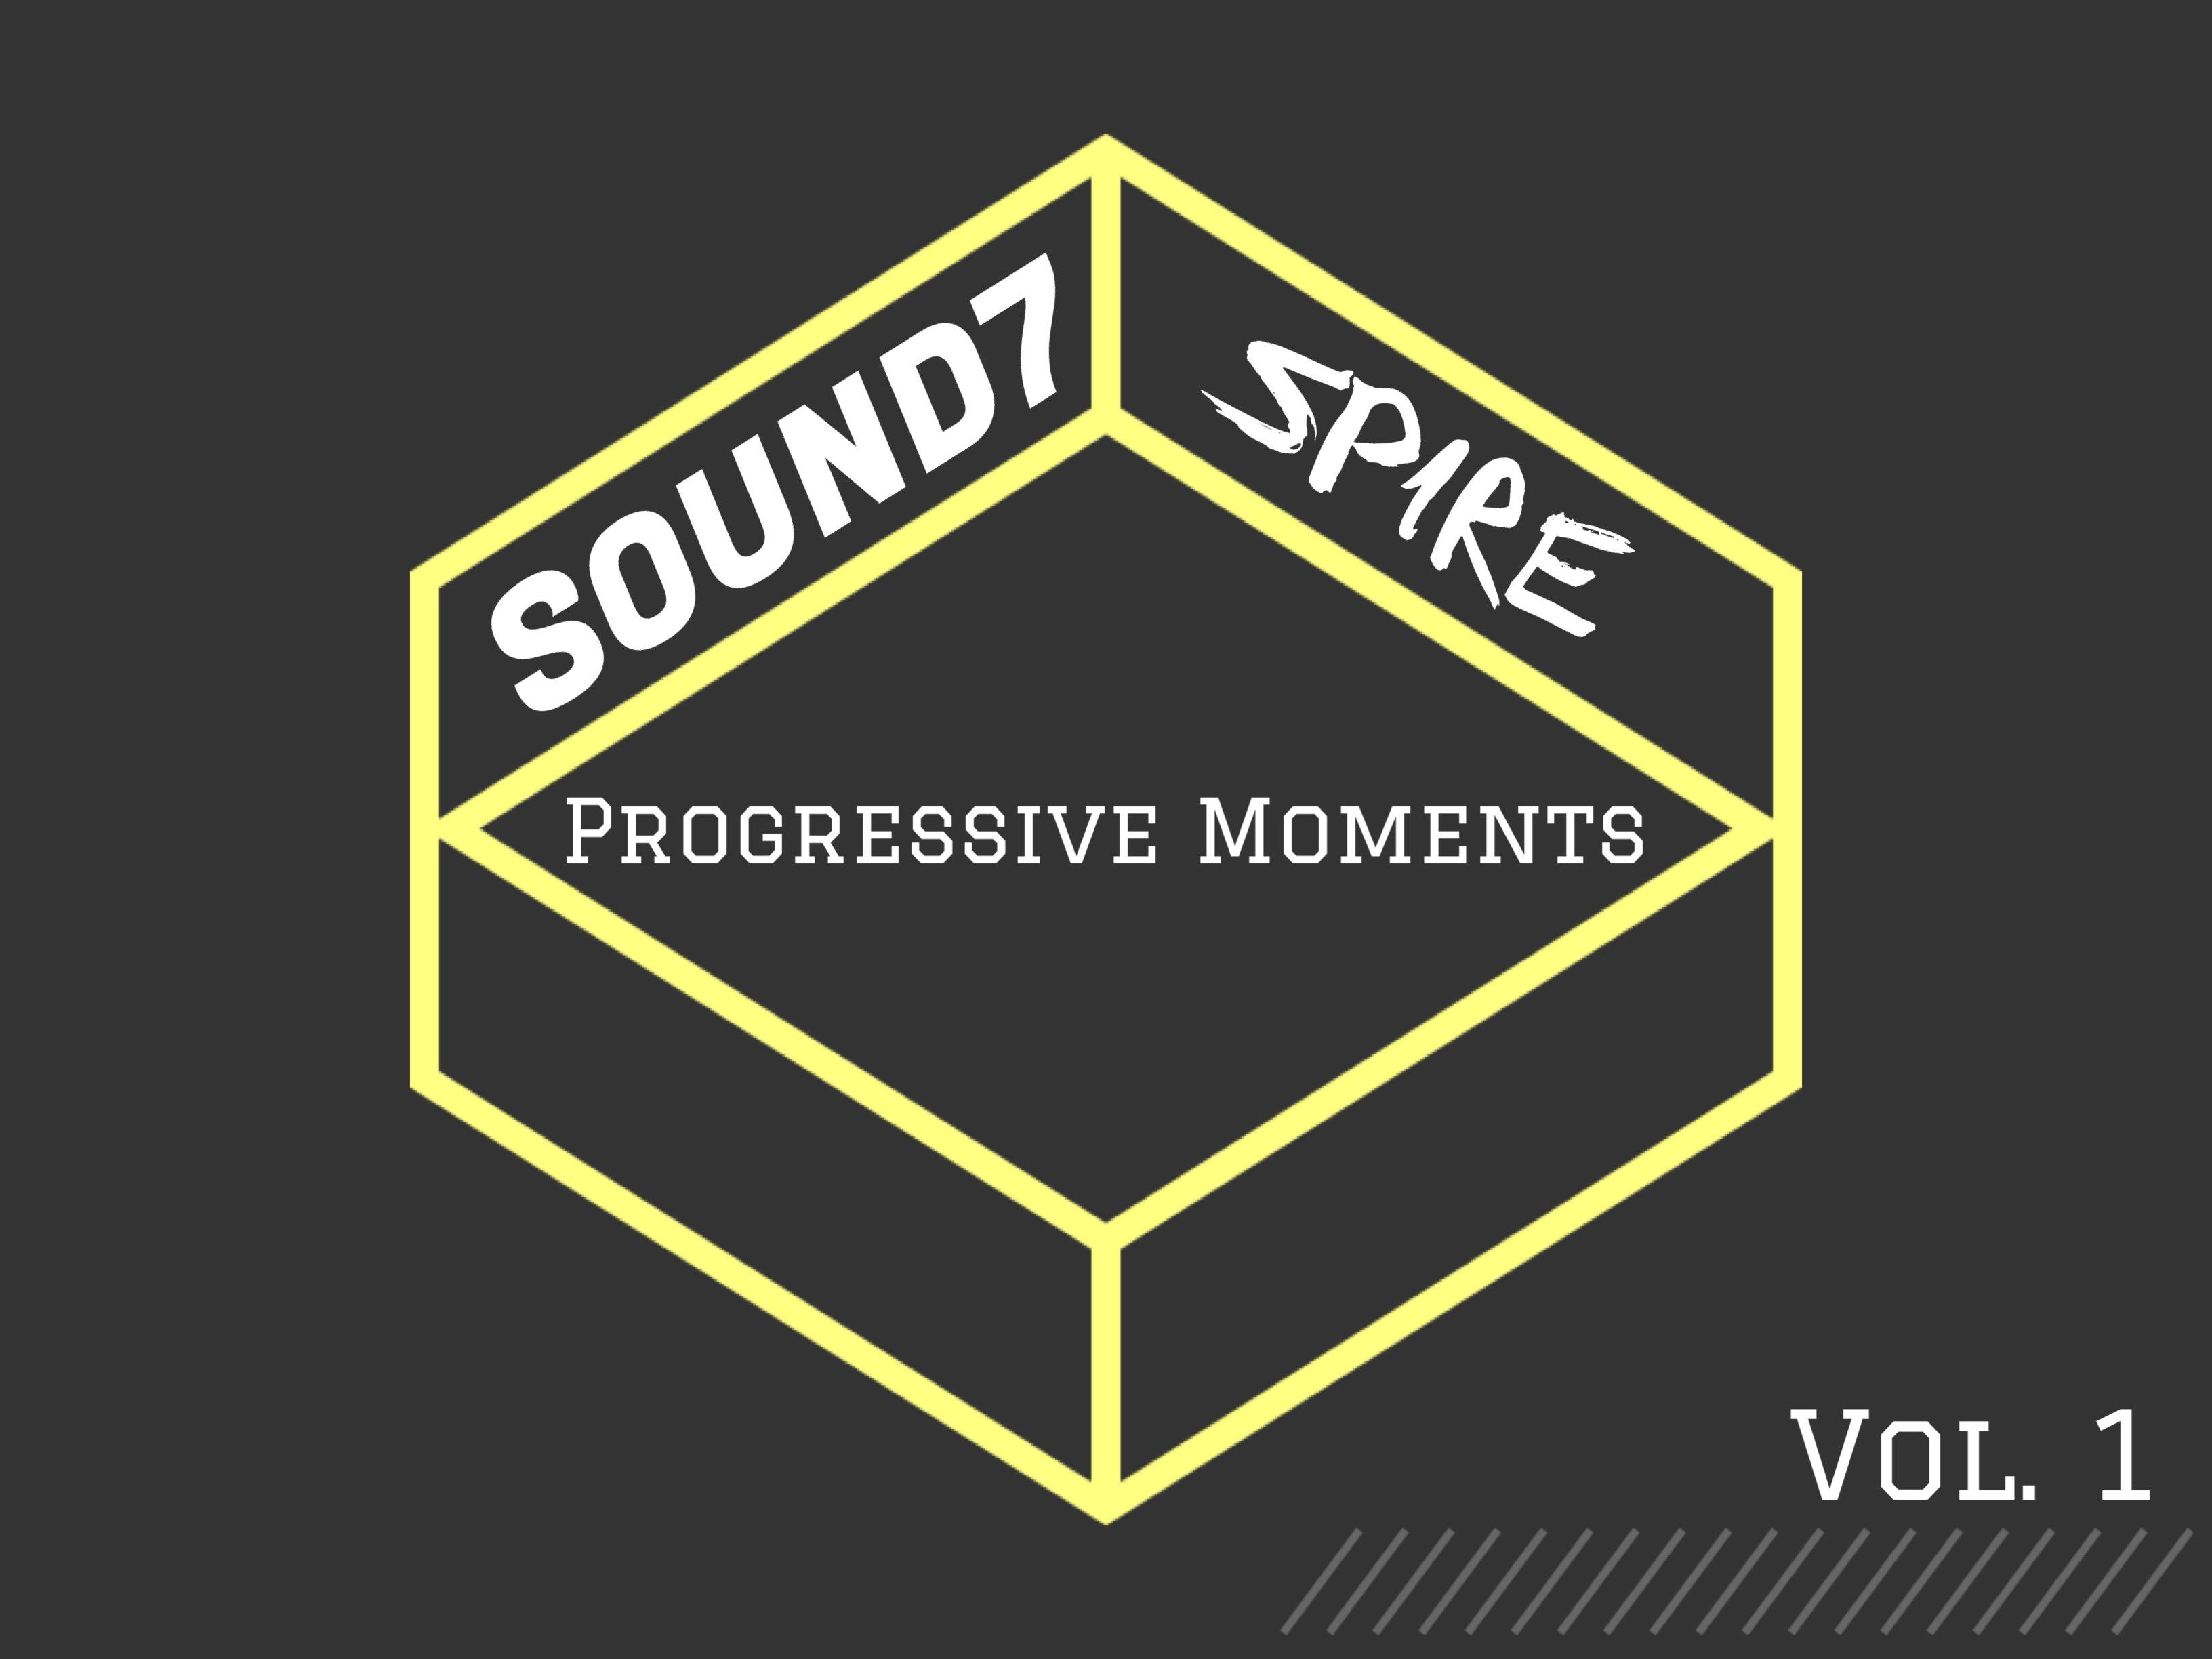 Spire Progressive Moments Vol. 1